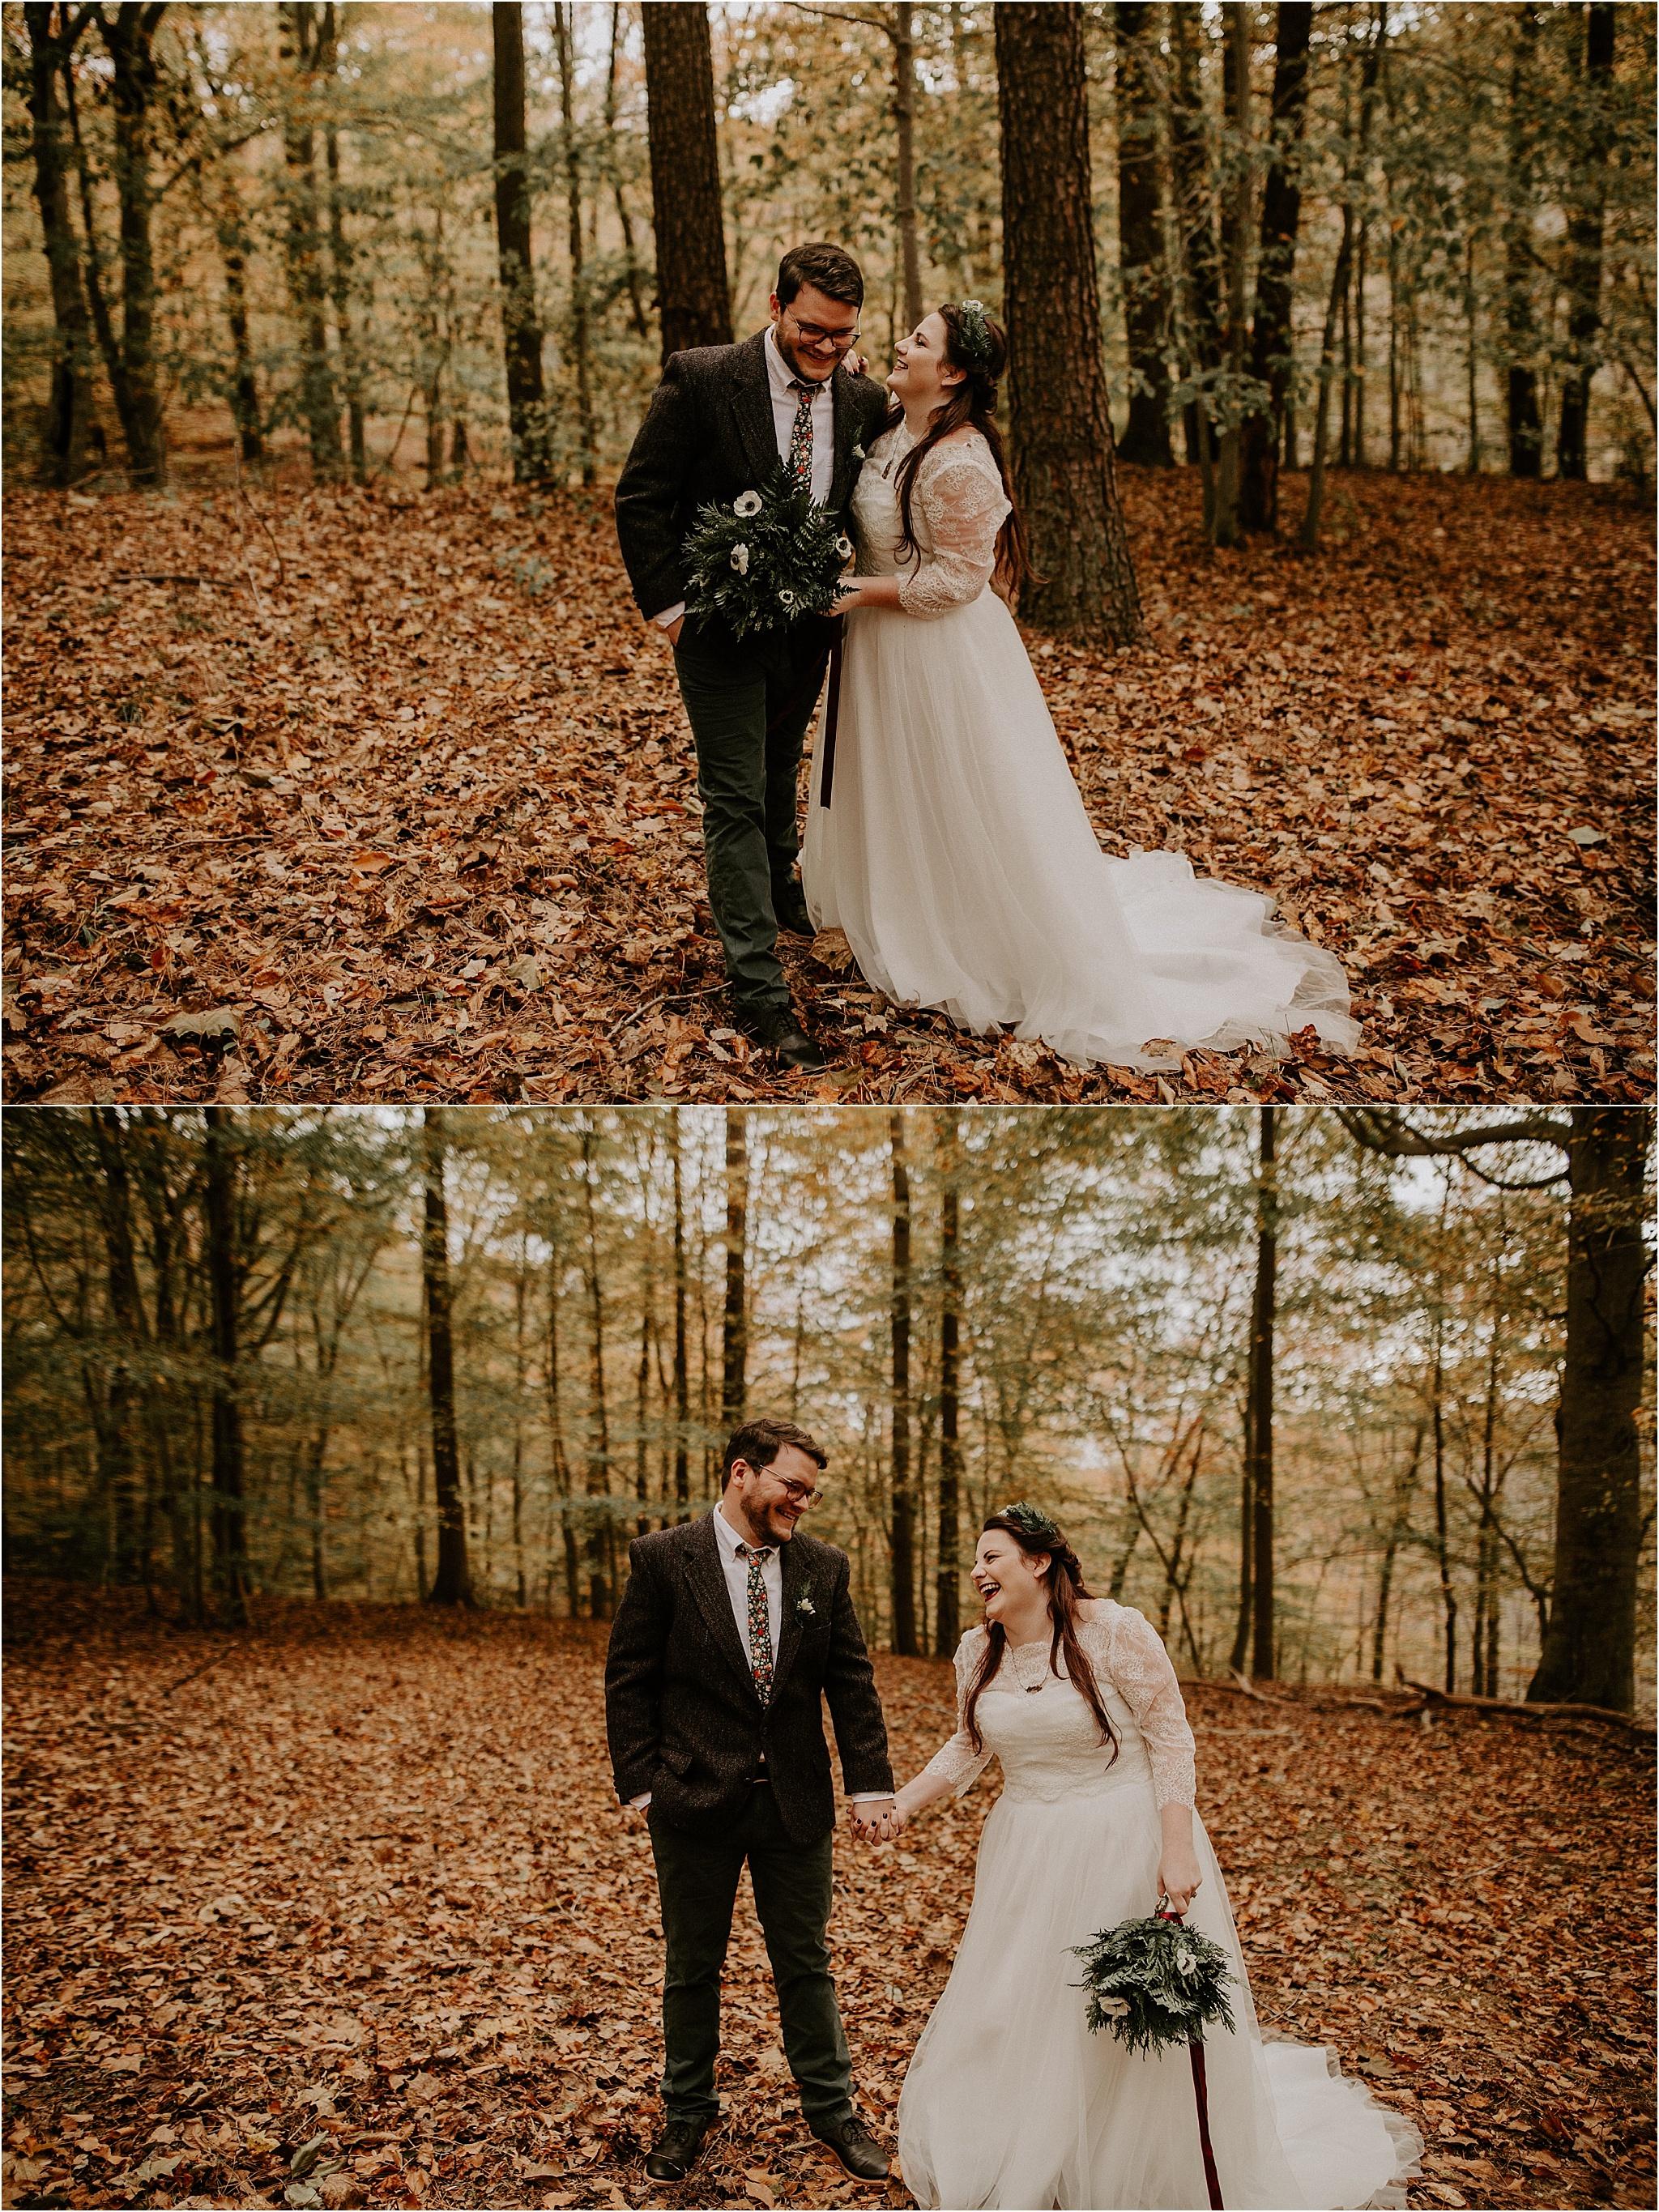 Sarah_Brookhart_Baltimore_Wedding_Photographer_0020.jpg